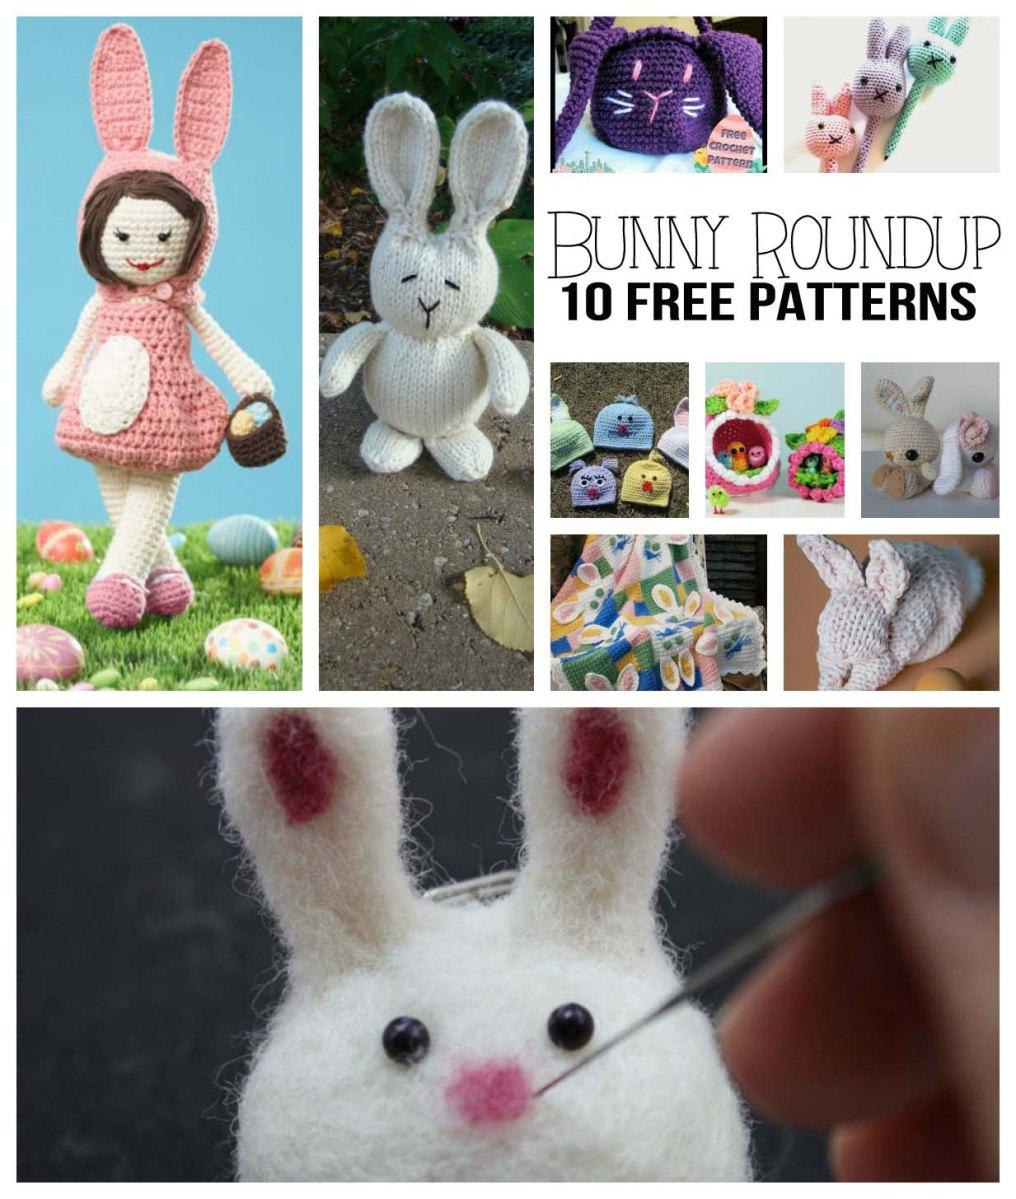 Bunny Roundup!